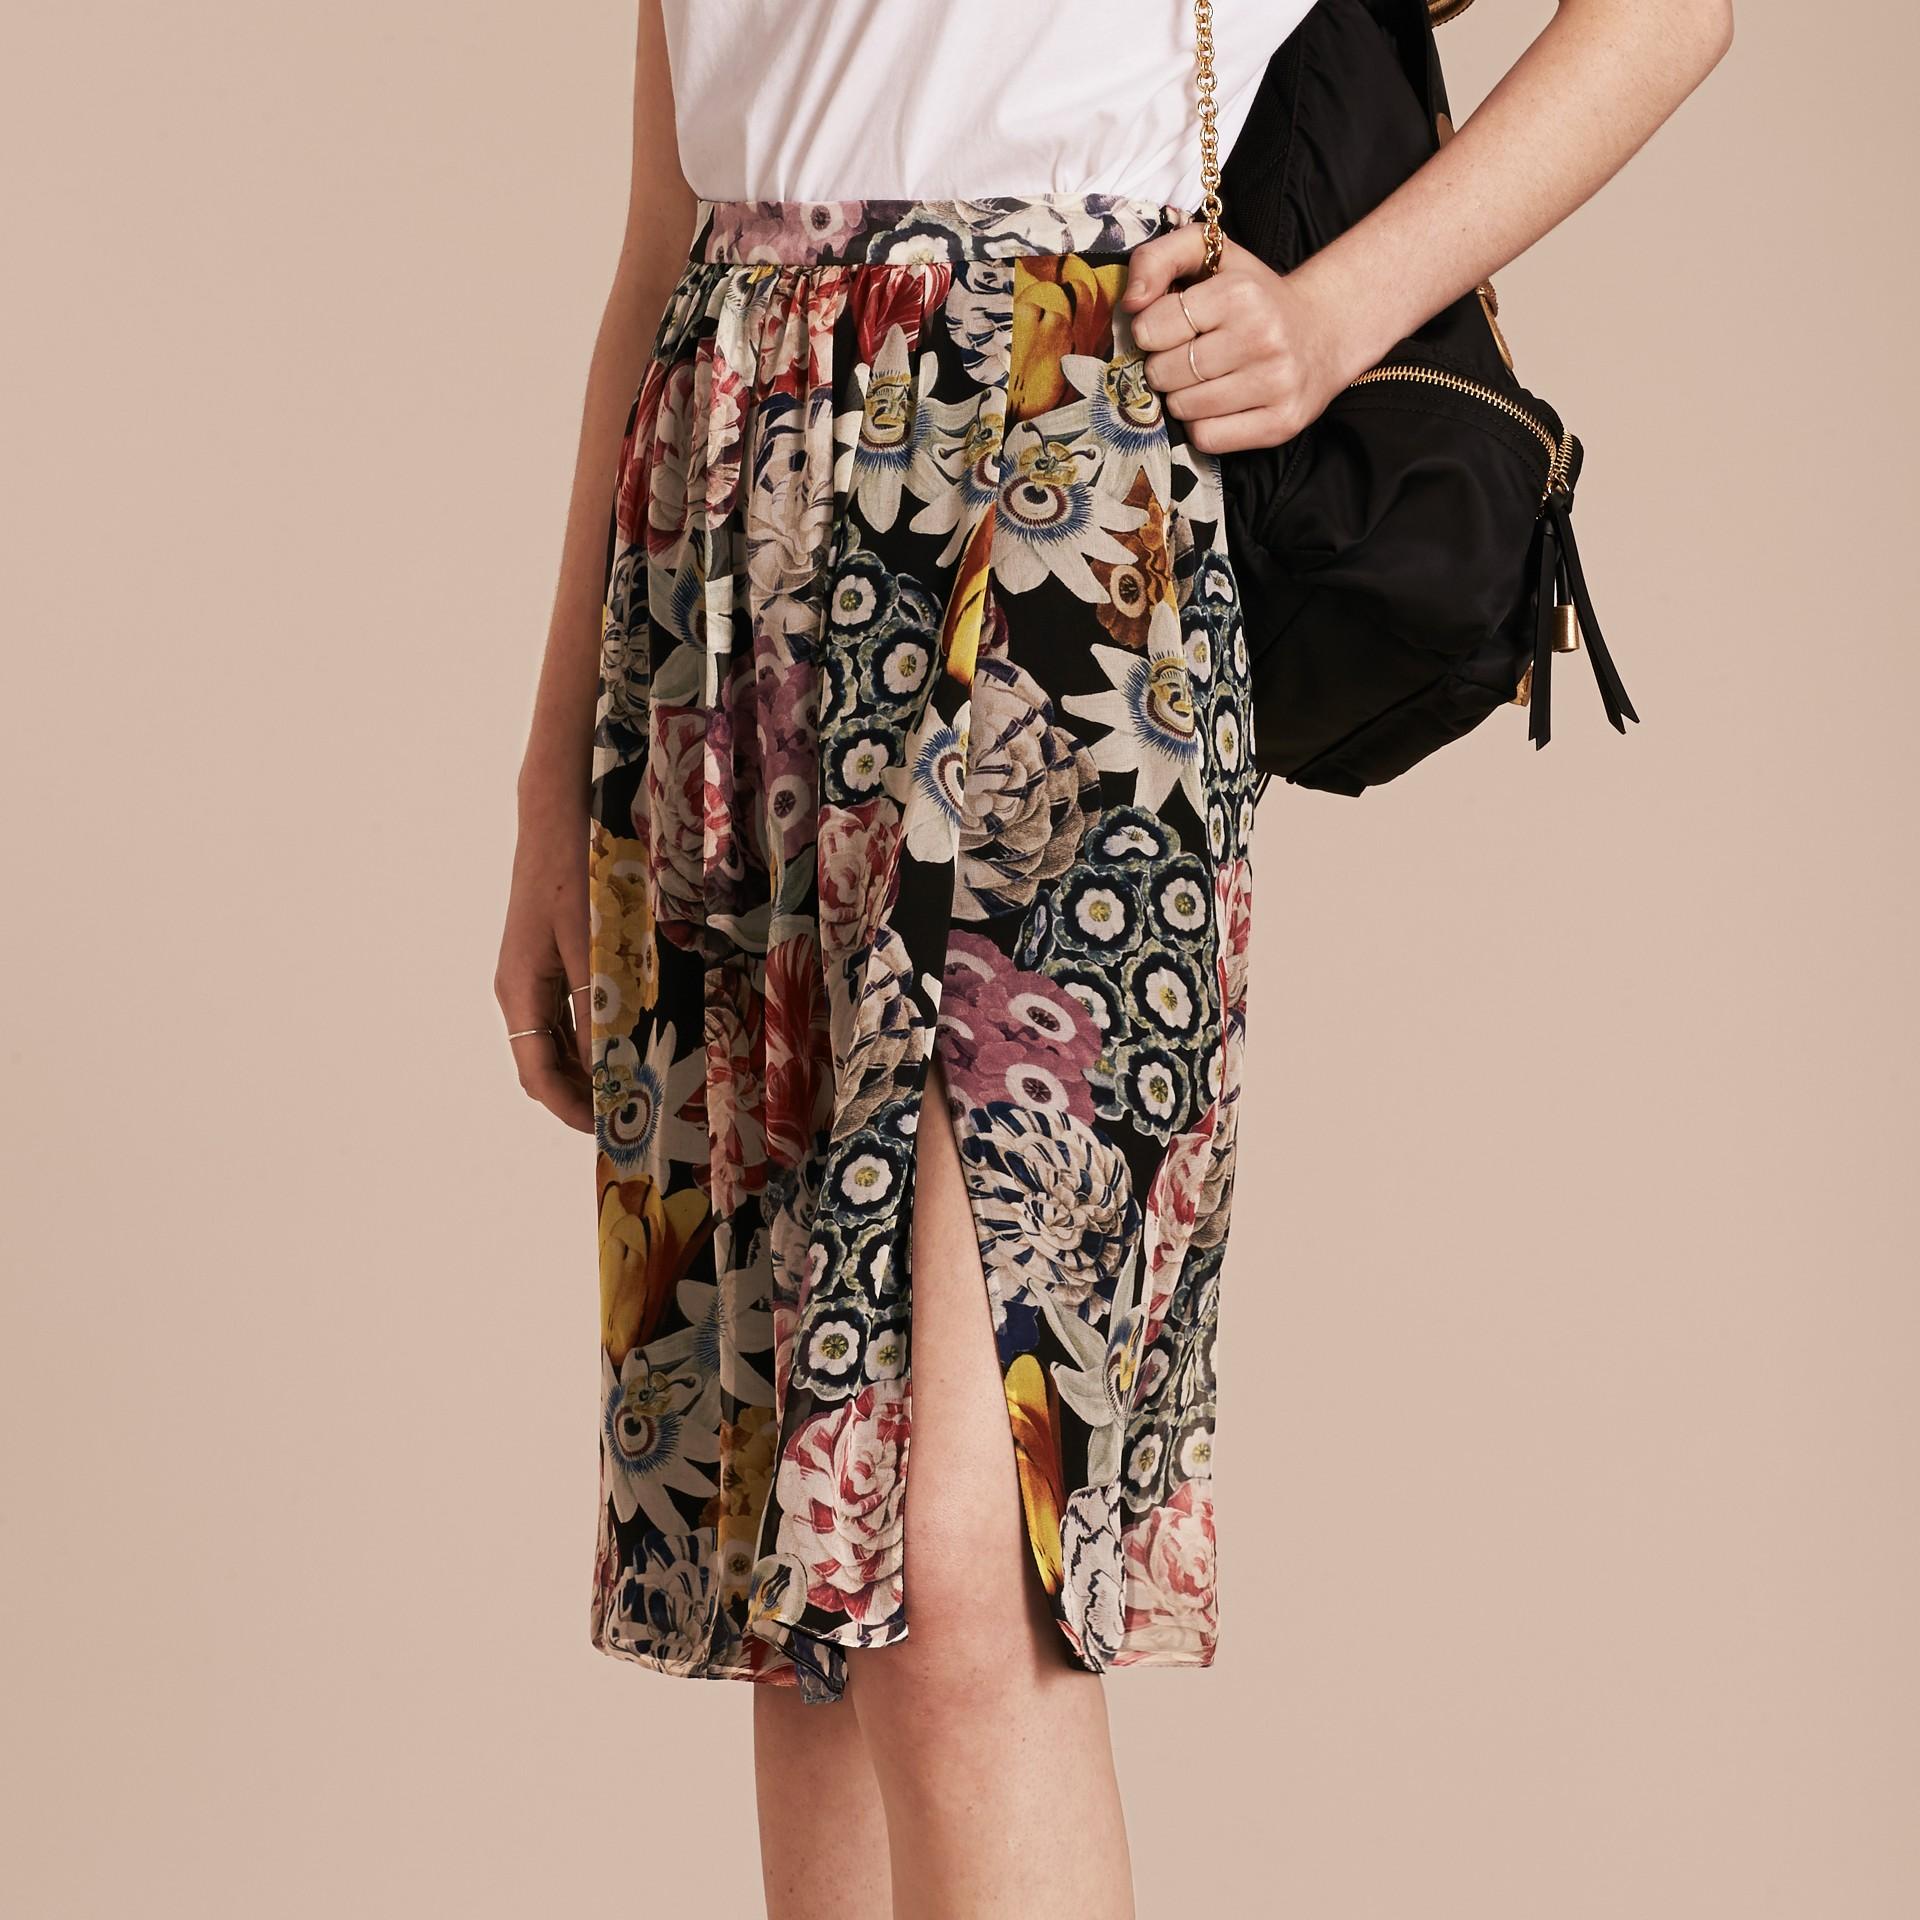 Schwarz Geraffter Seidenrock mit floralem Muster - Galerie-Bild 6